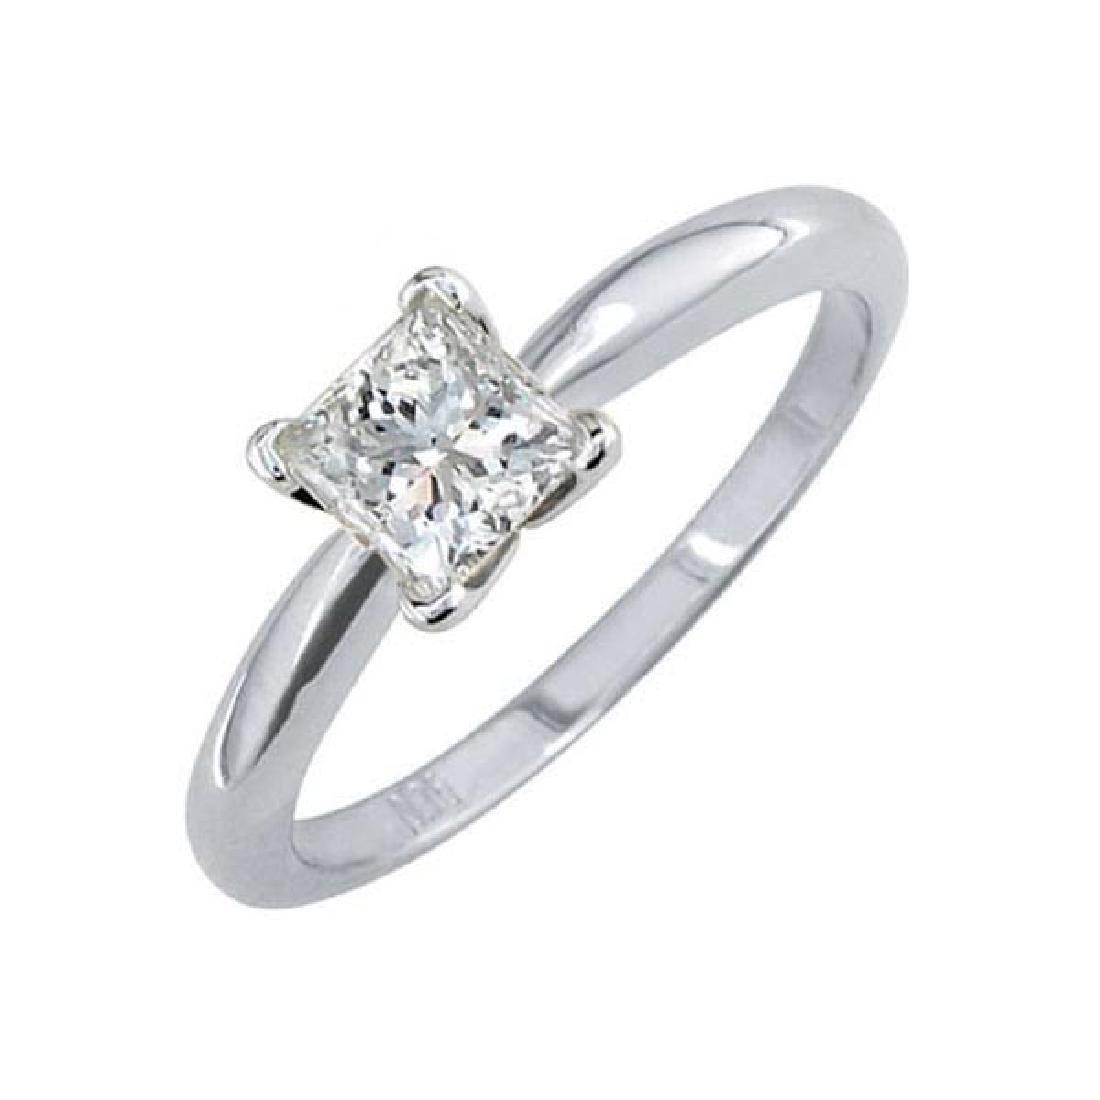 Certified 0.7 CTW Princess Diamond Solitaire 14k Ring F